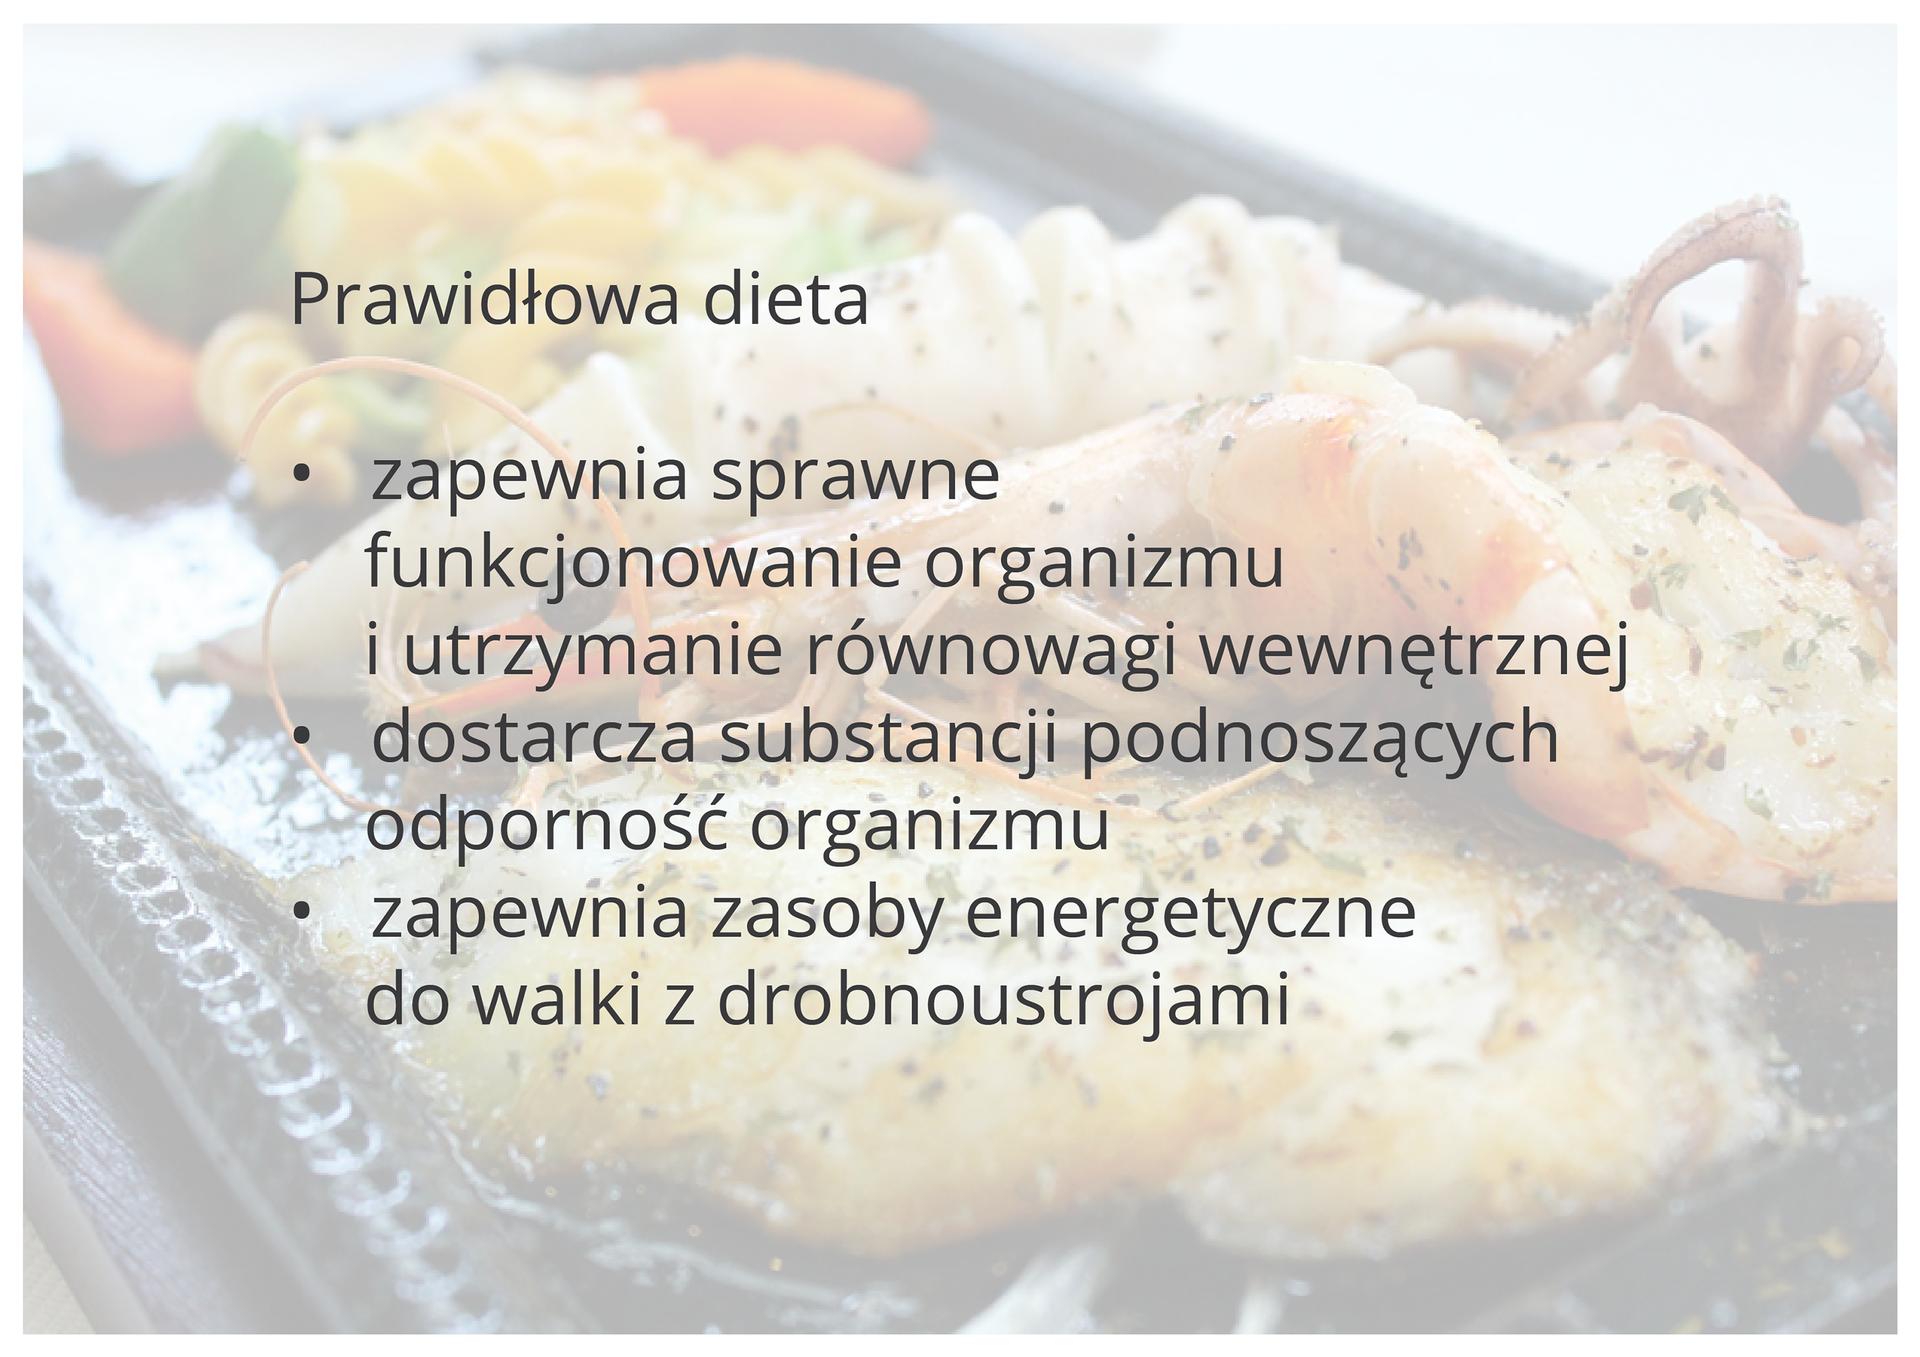 Prawidłowa dieta